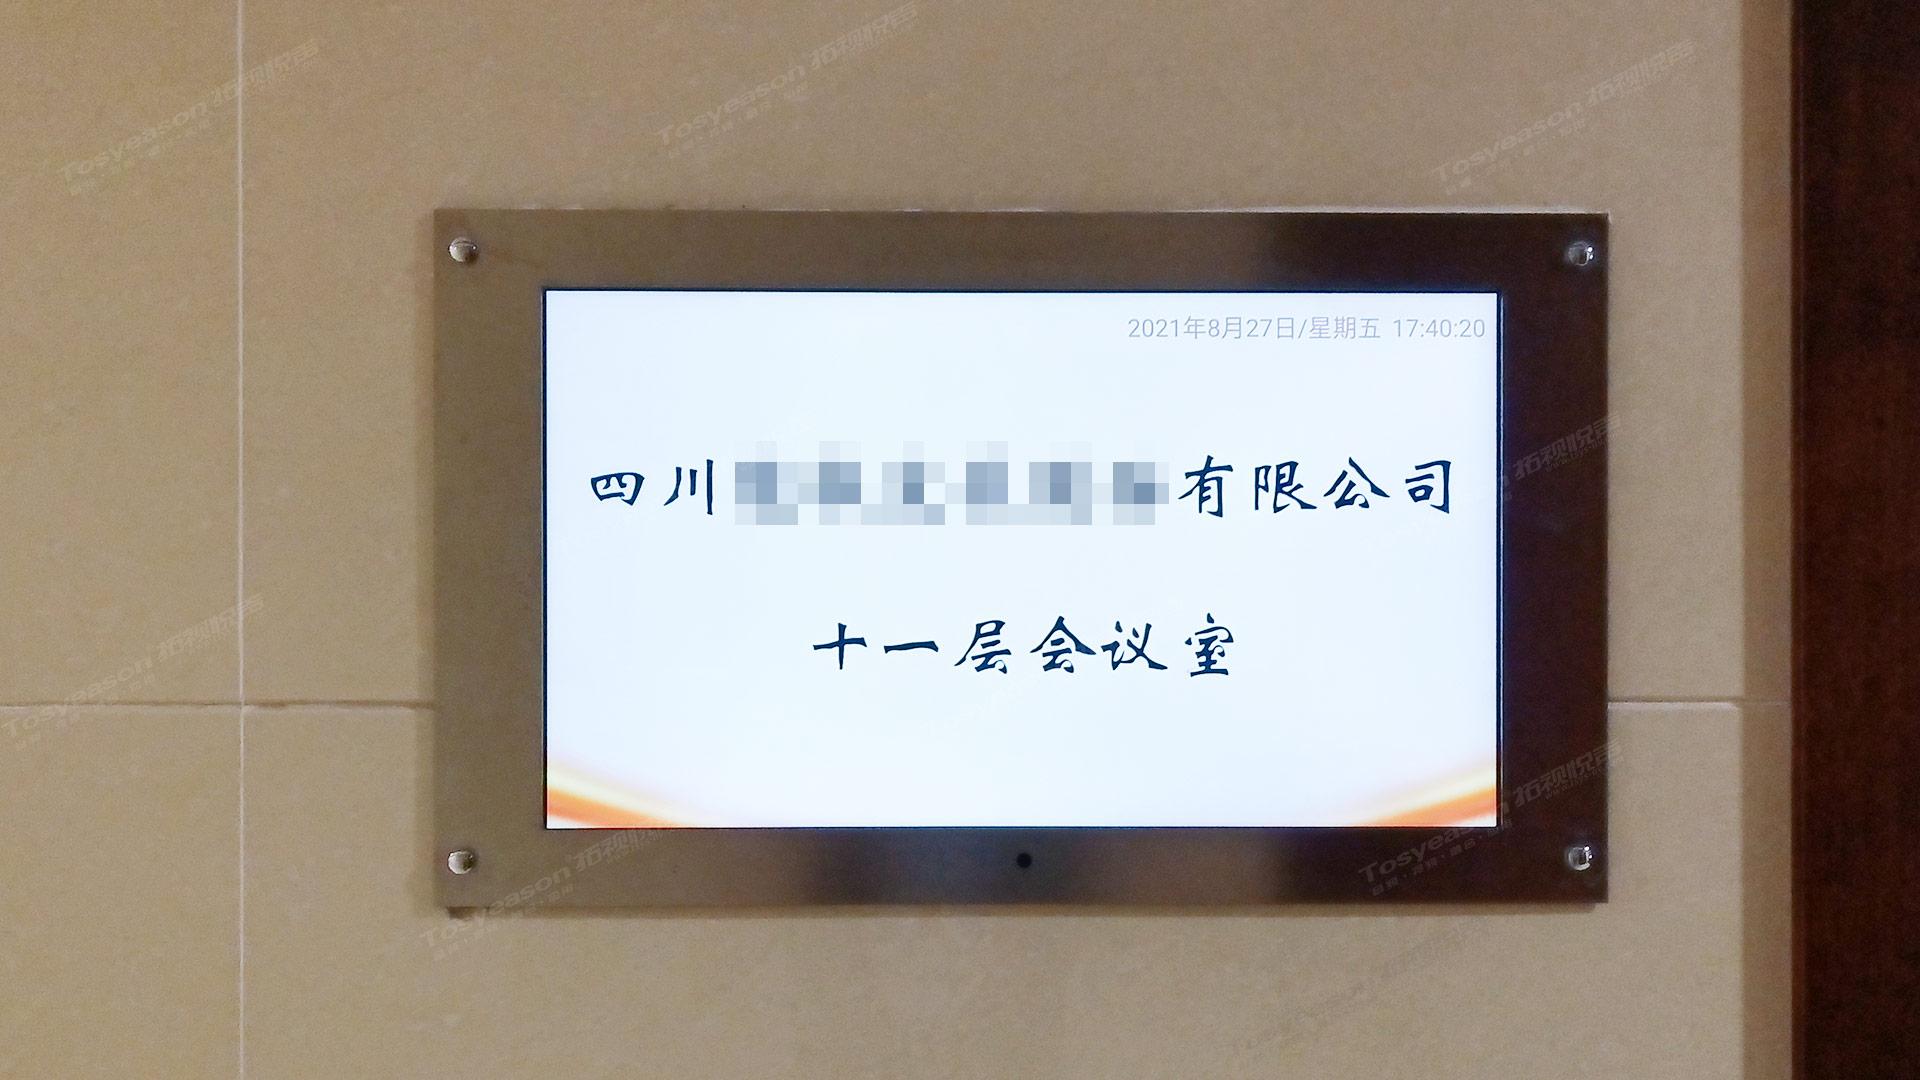 11c1.jpg